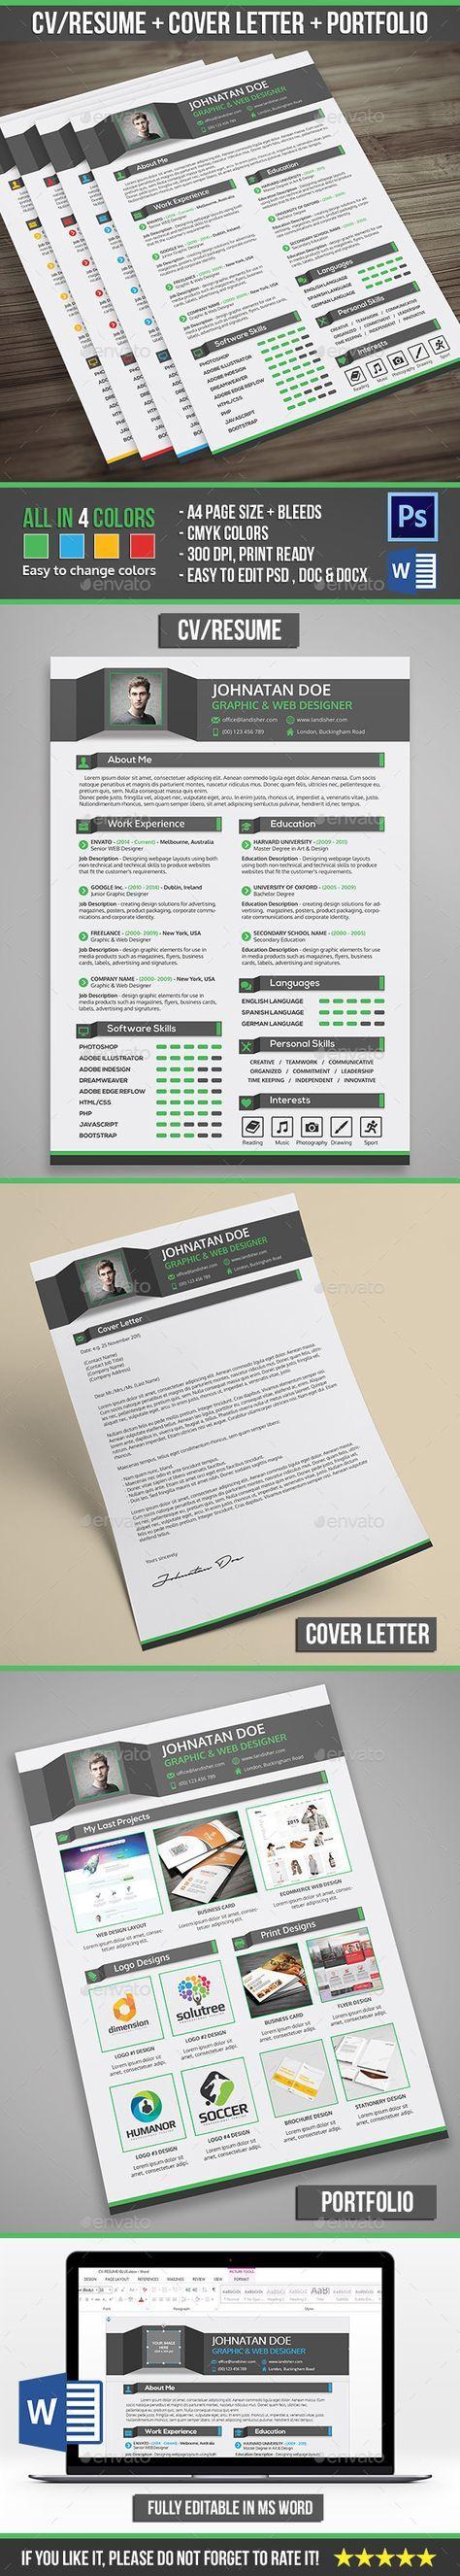 Contoh Application Letter Presenter] eye grabbing chef resume ...